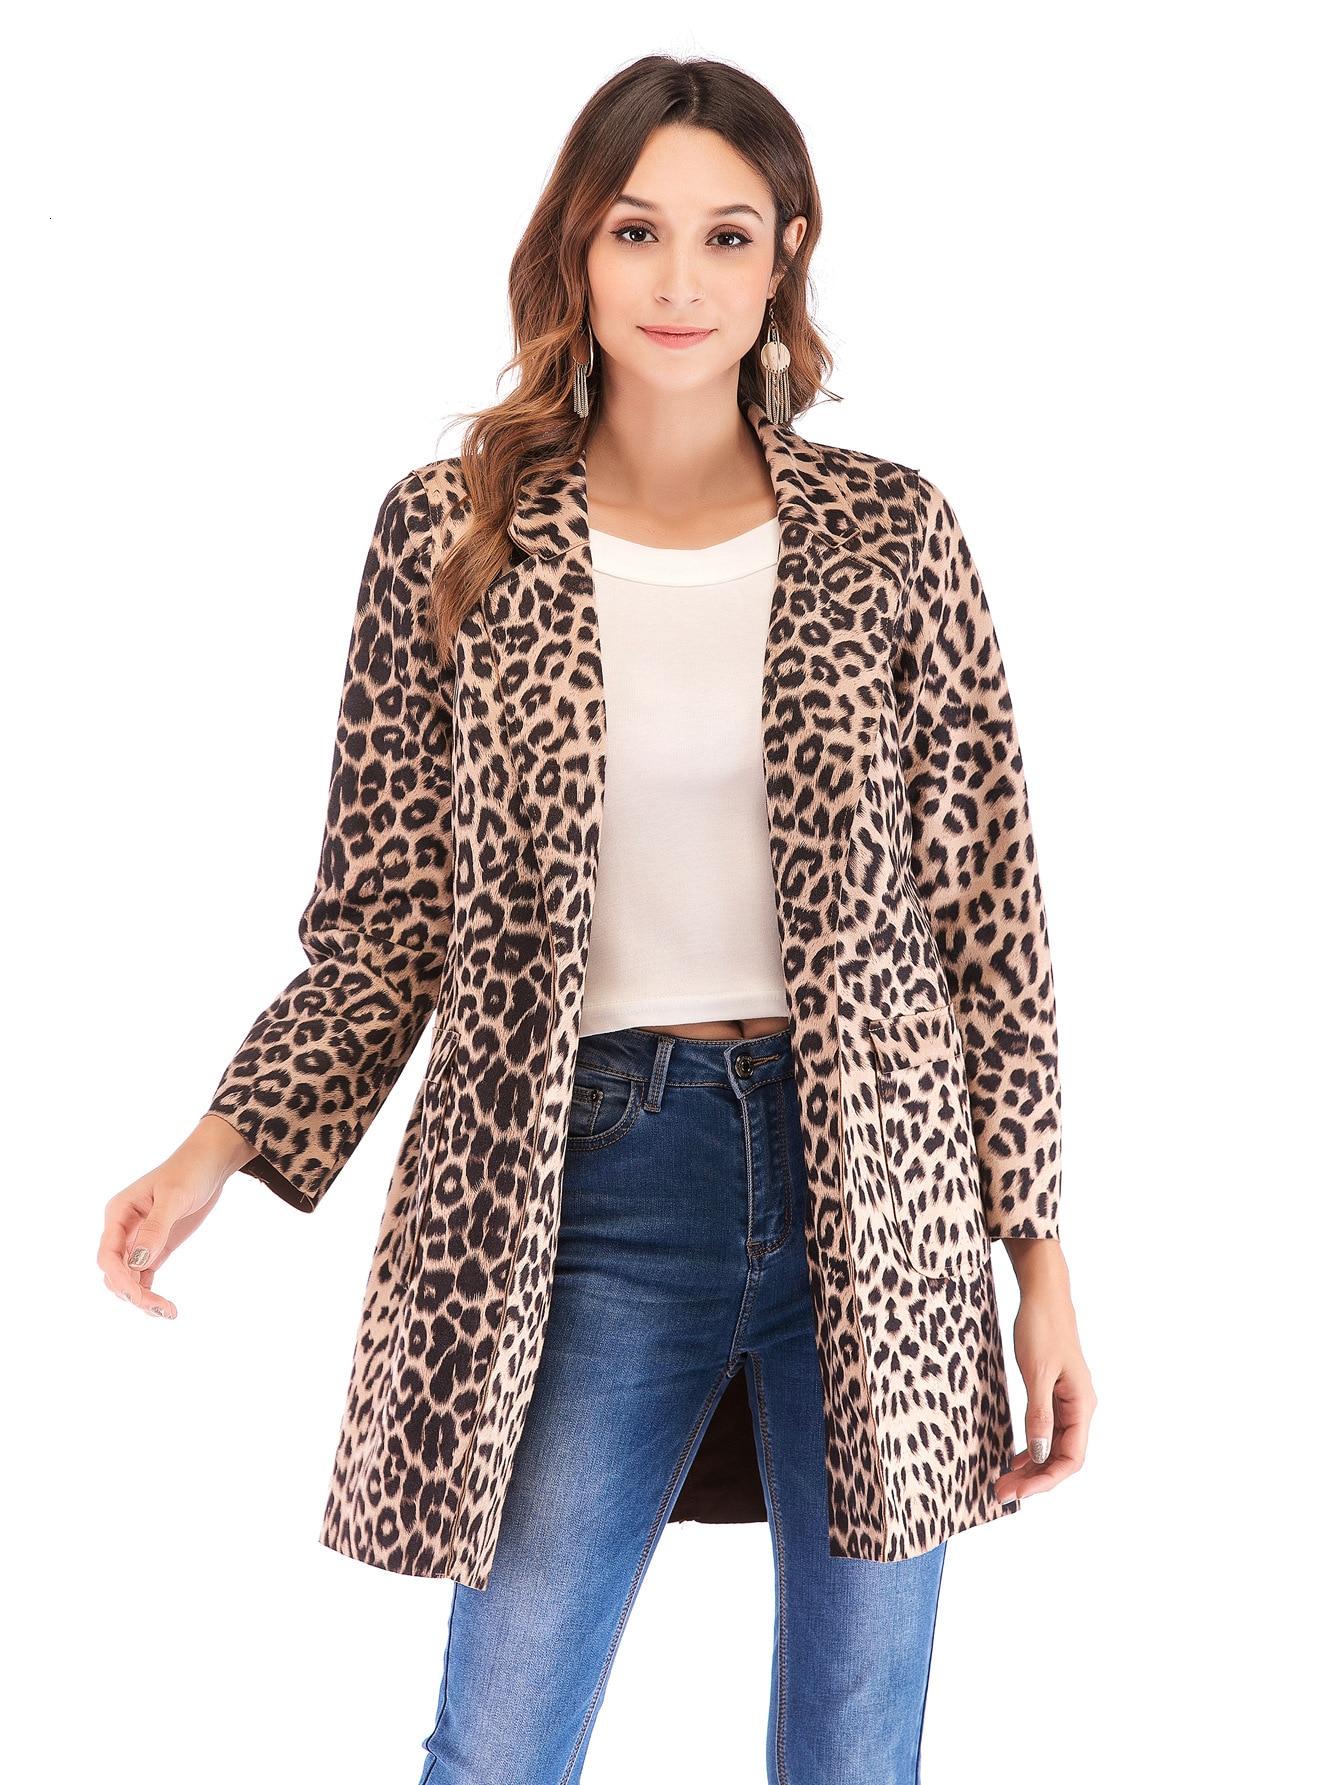 BacklakeGirls Autumn Winter Warm Leopard Print Long Sleeve Woollen Cardigan Sweater With Pocket Elegant Women Loose Coat